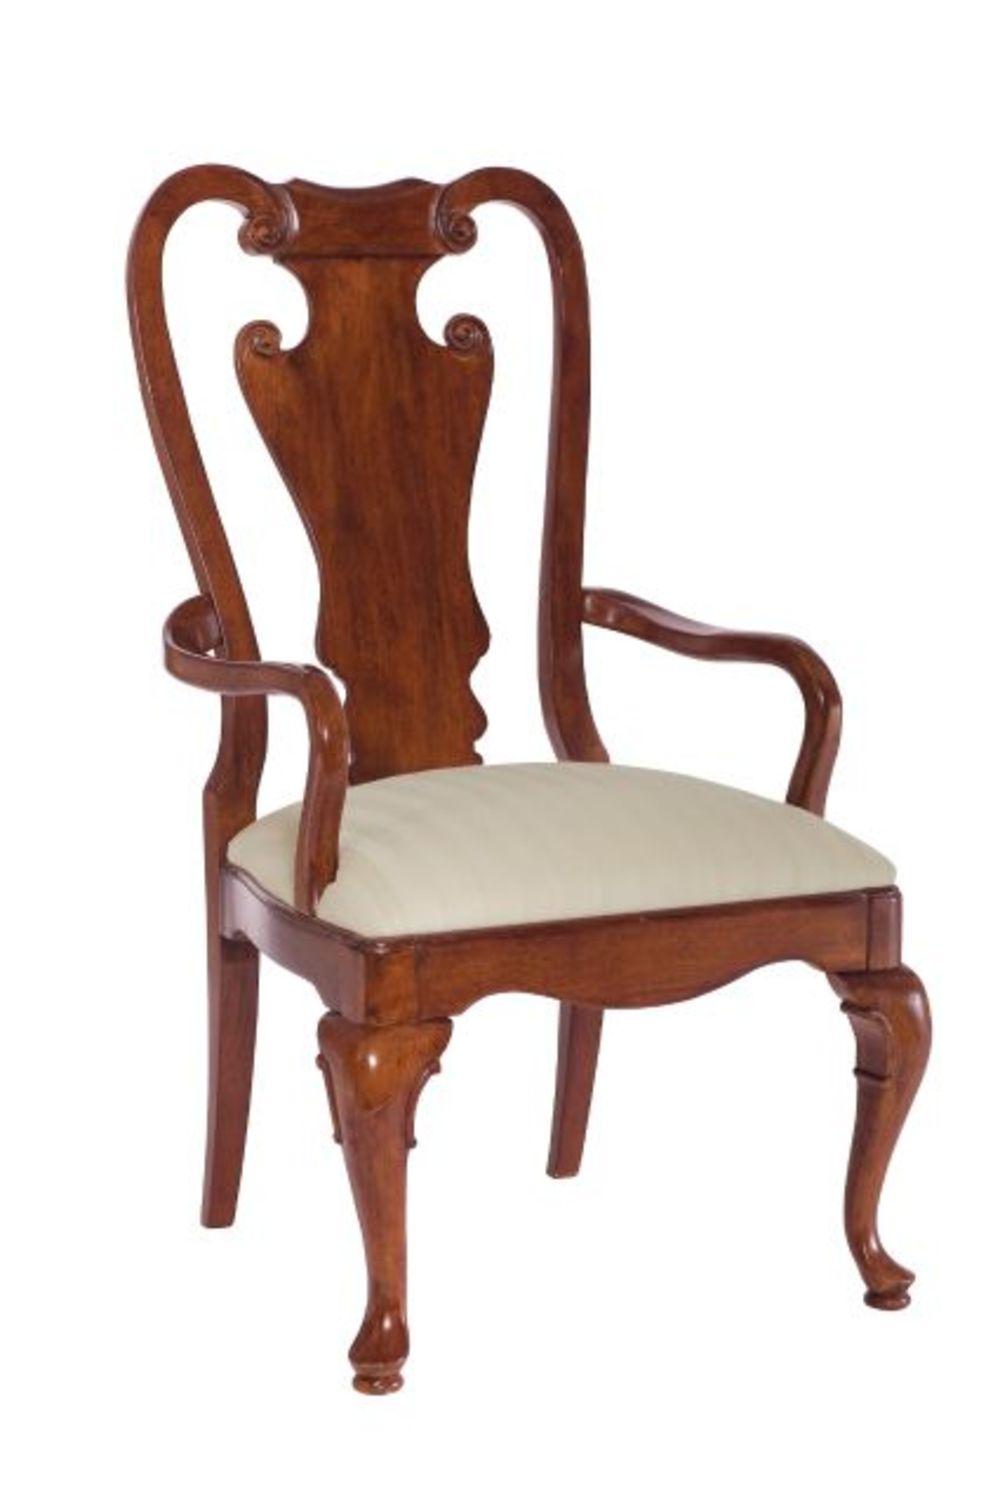 American Drew - Splat Back Arm Chair